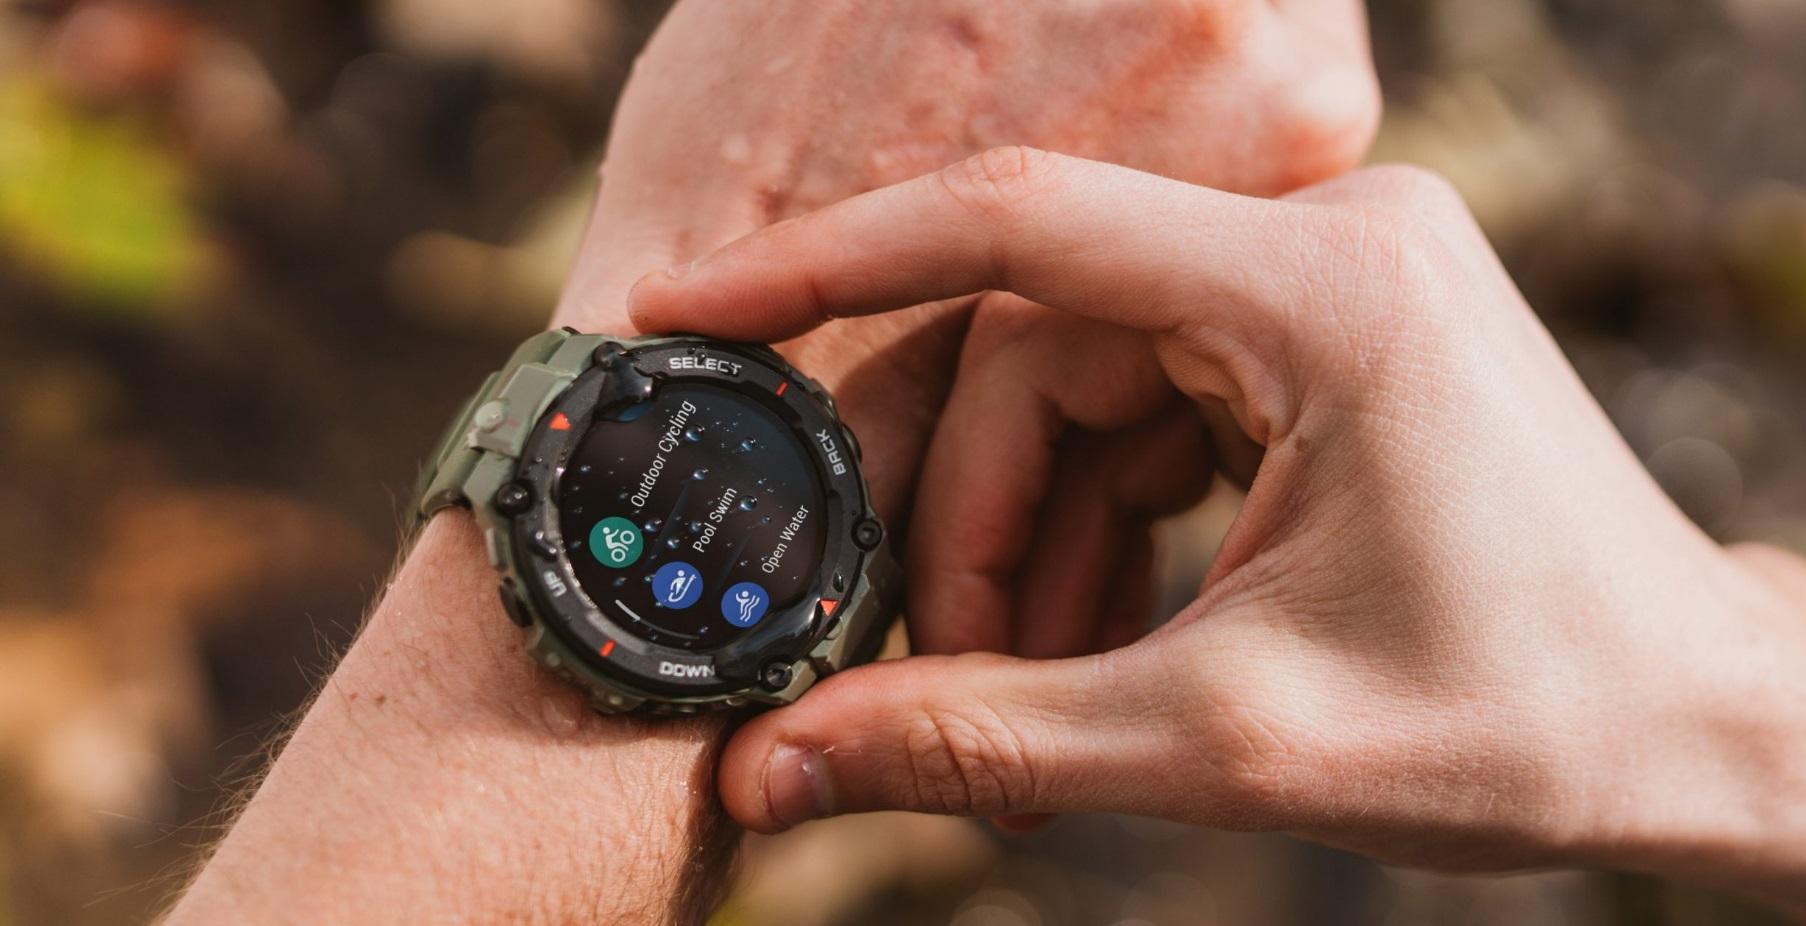 Chytré hodinky a vysavač od Xiaomi v akci! [sponzorovaný článek]